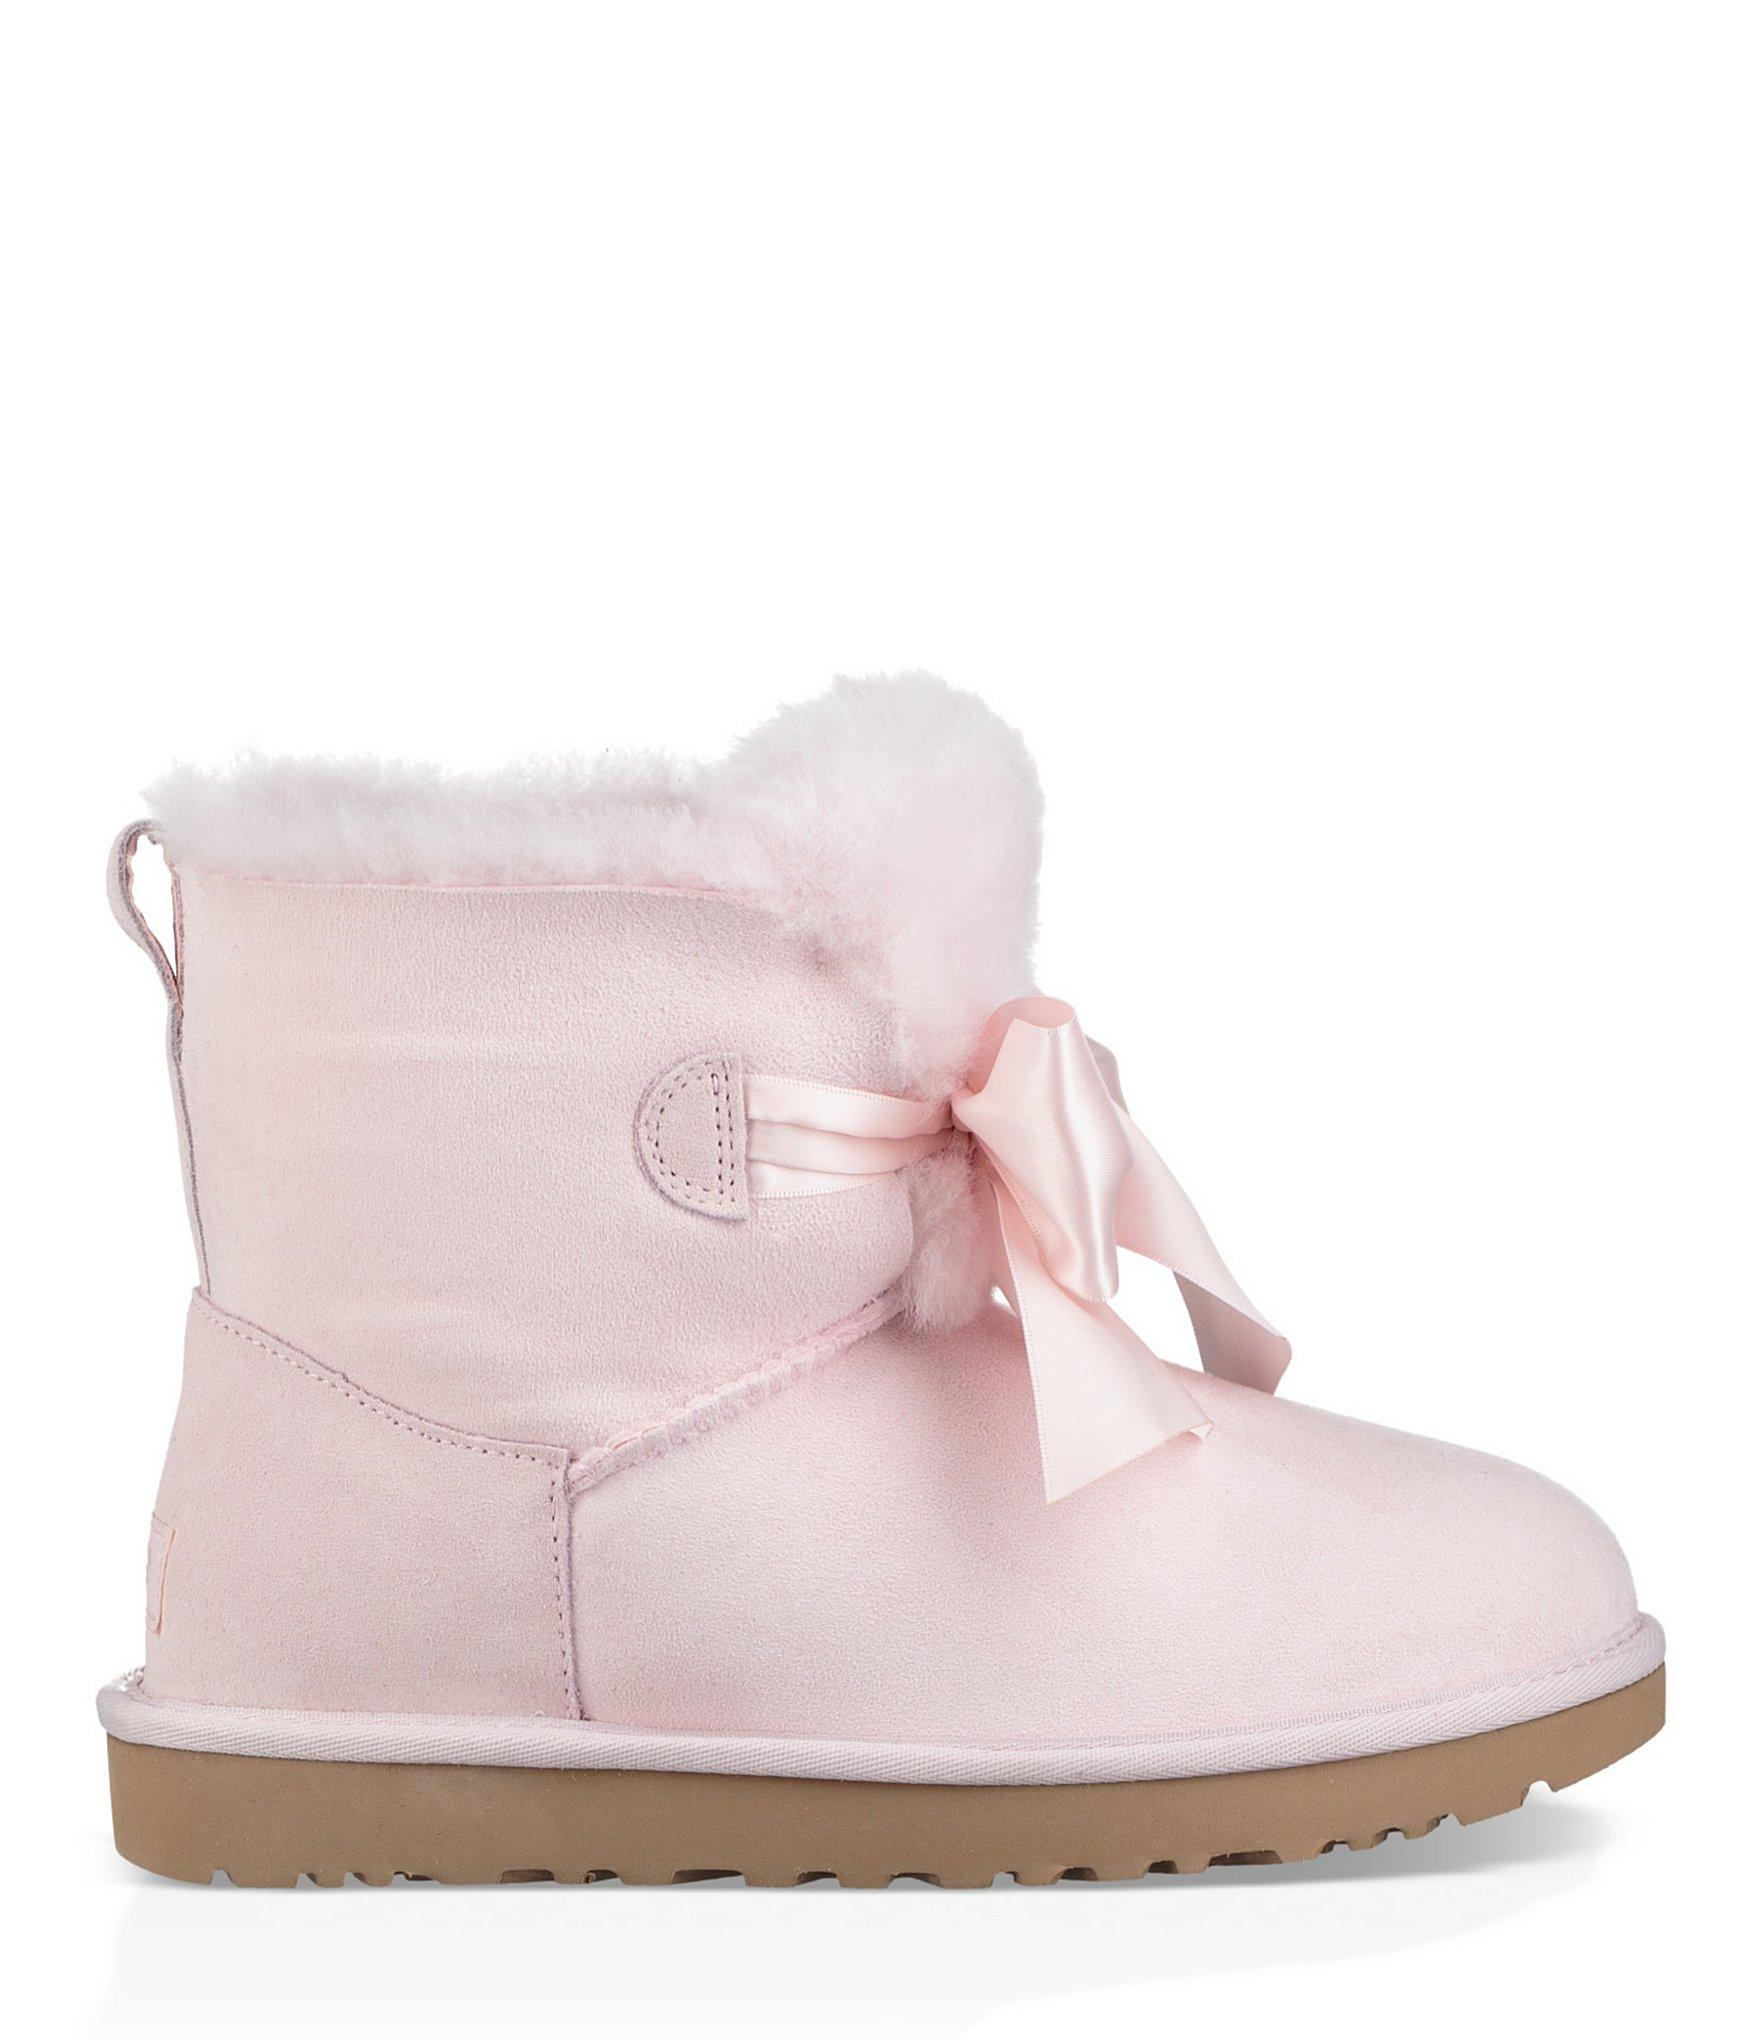 835e24cc41d35 Lyst - Ugg Gita Bow Mini Booties in Pink